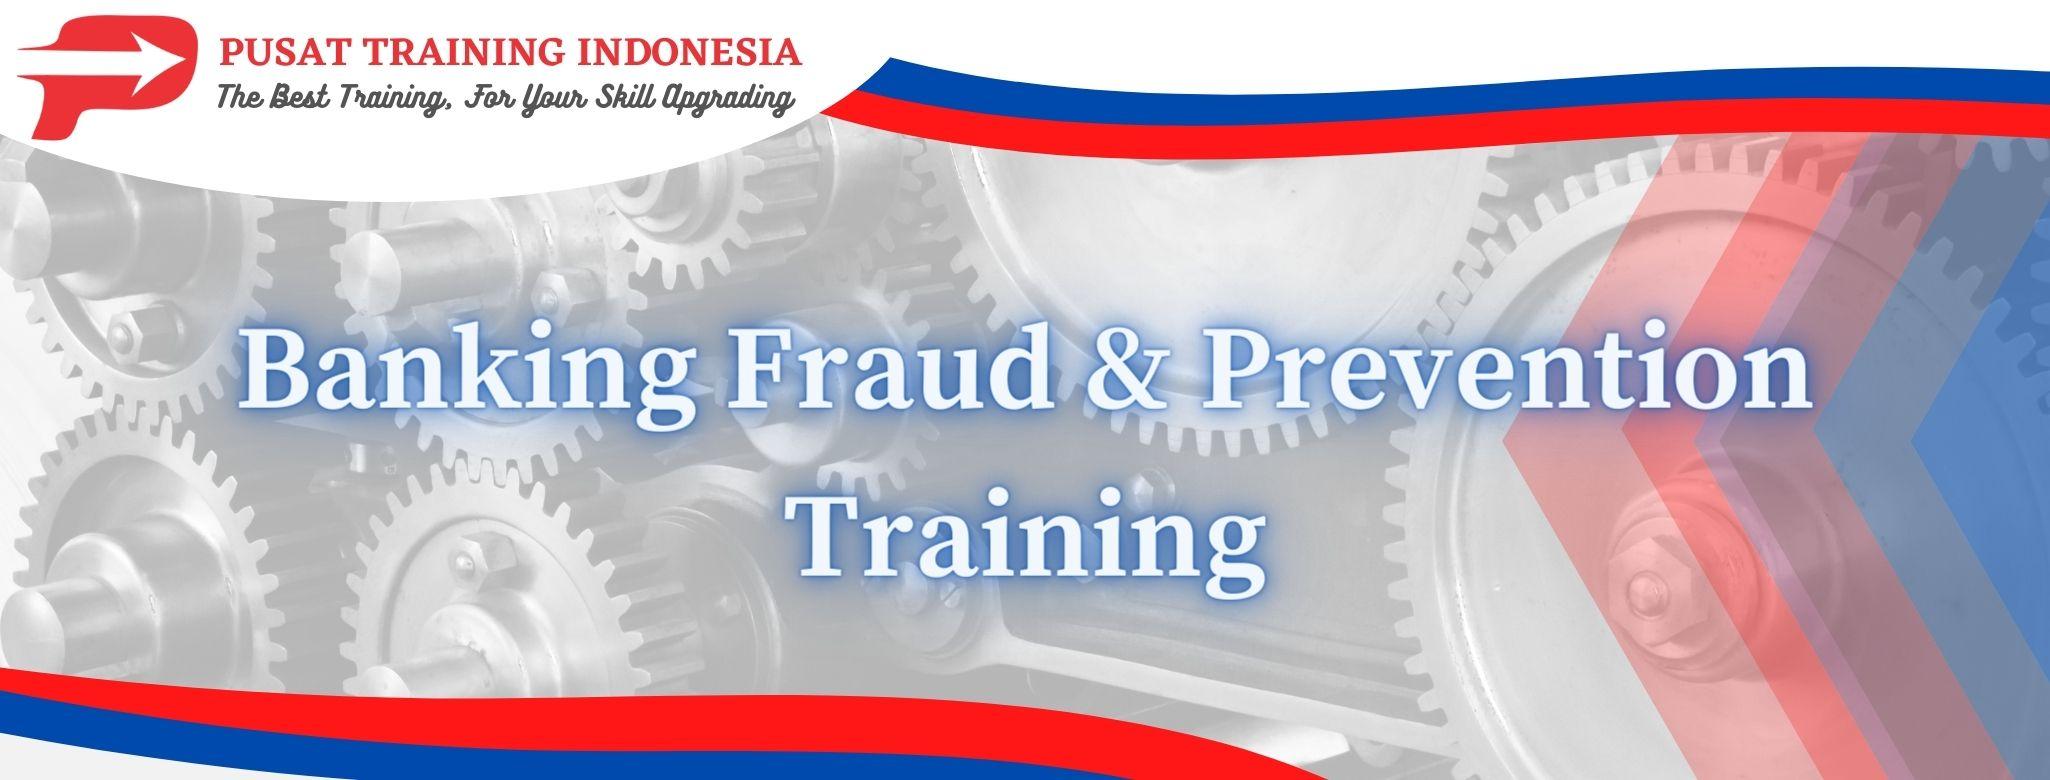 Banking-Fraud-Prevention-Training